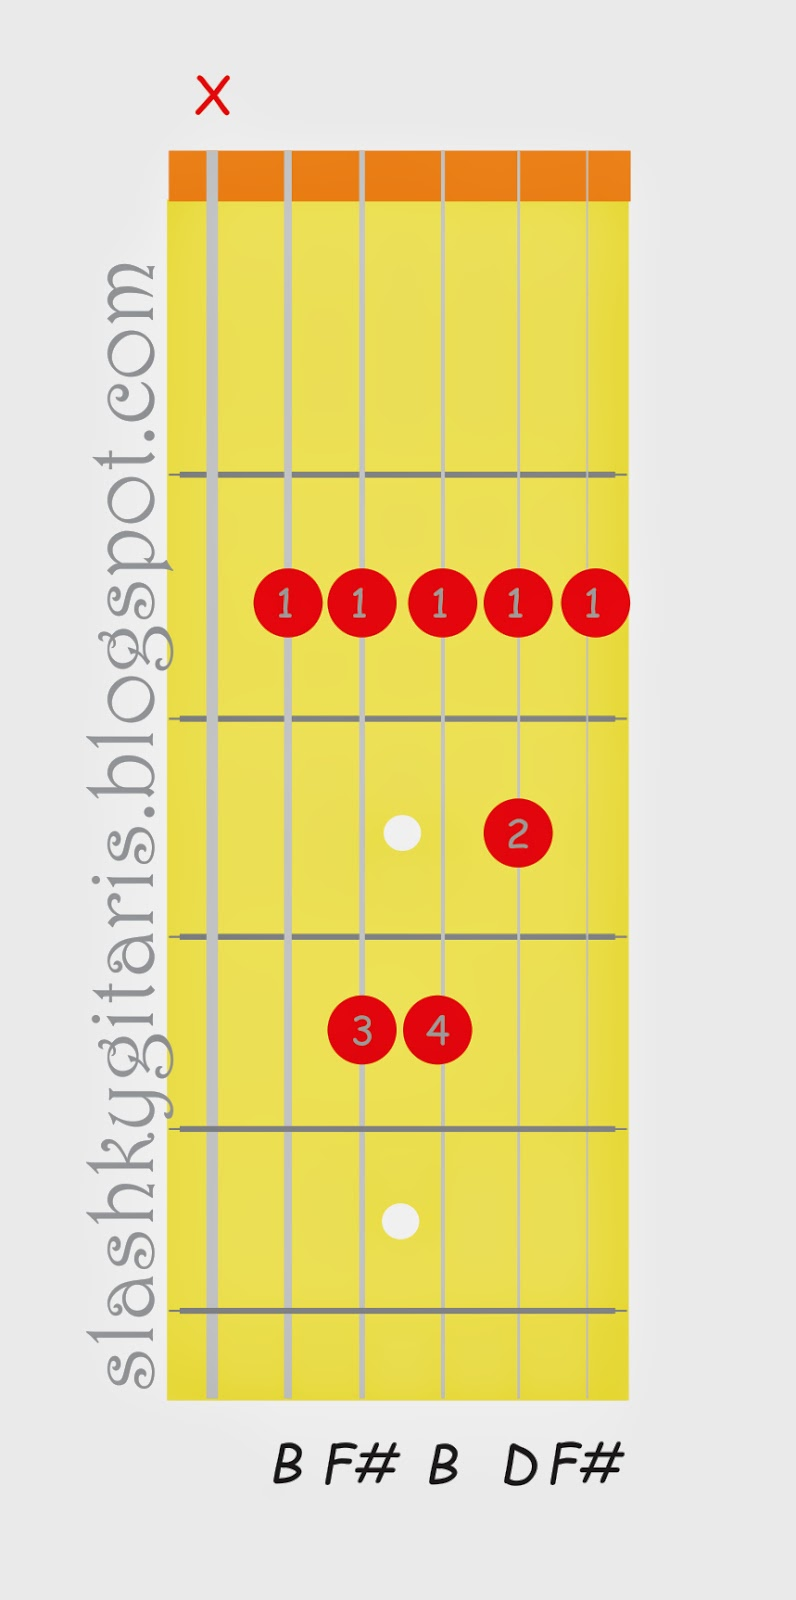 belajar chord gitar, belajar gitar, belajar gitar pemula, belajar kunci gitar, kunci B minor, kunci gitar,